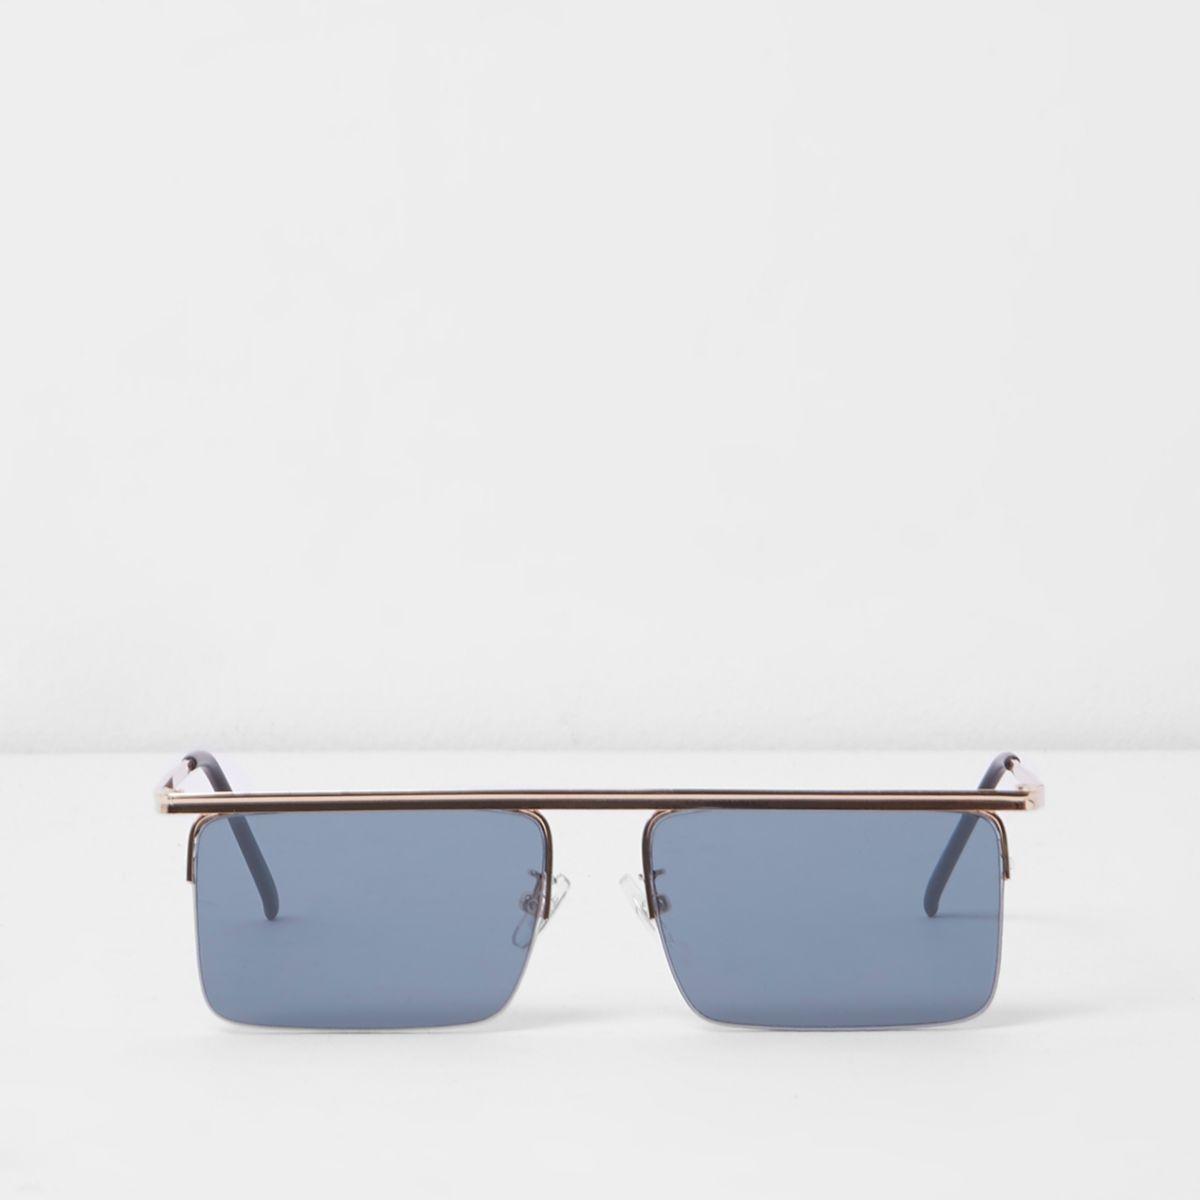 Goudkleurige vierkante visorzonnebril met getinte glazen